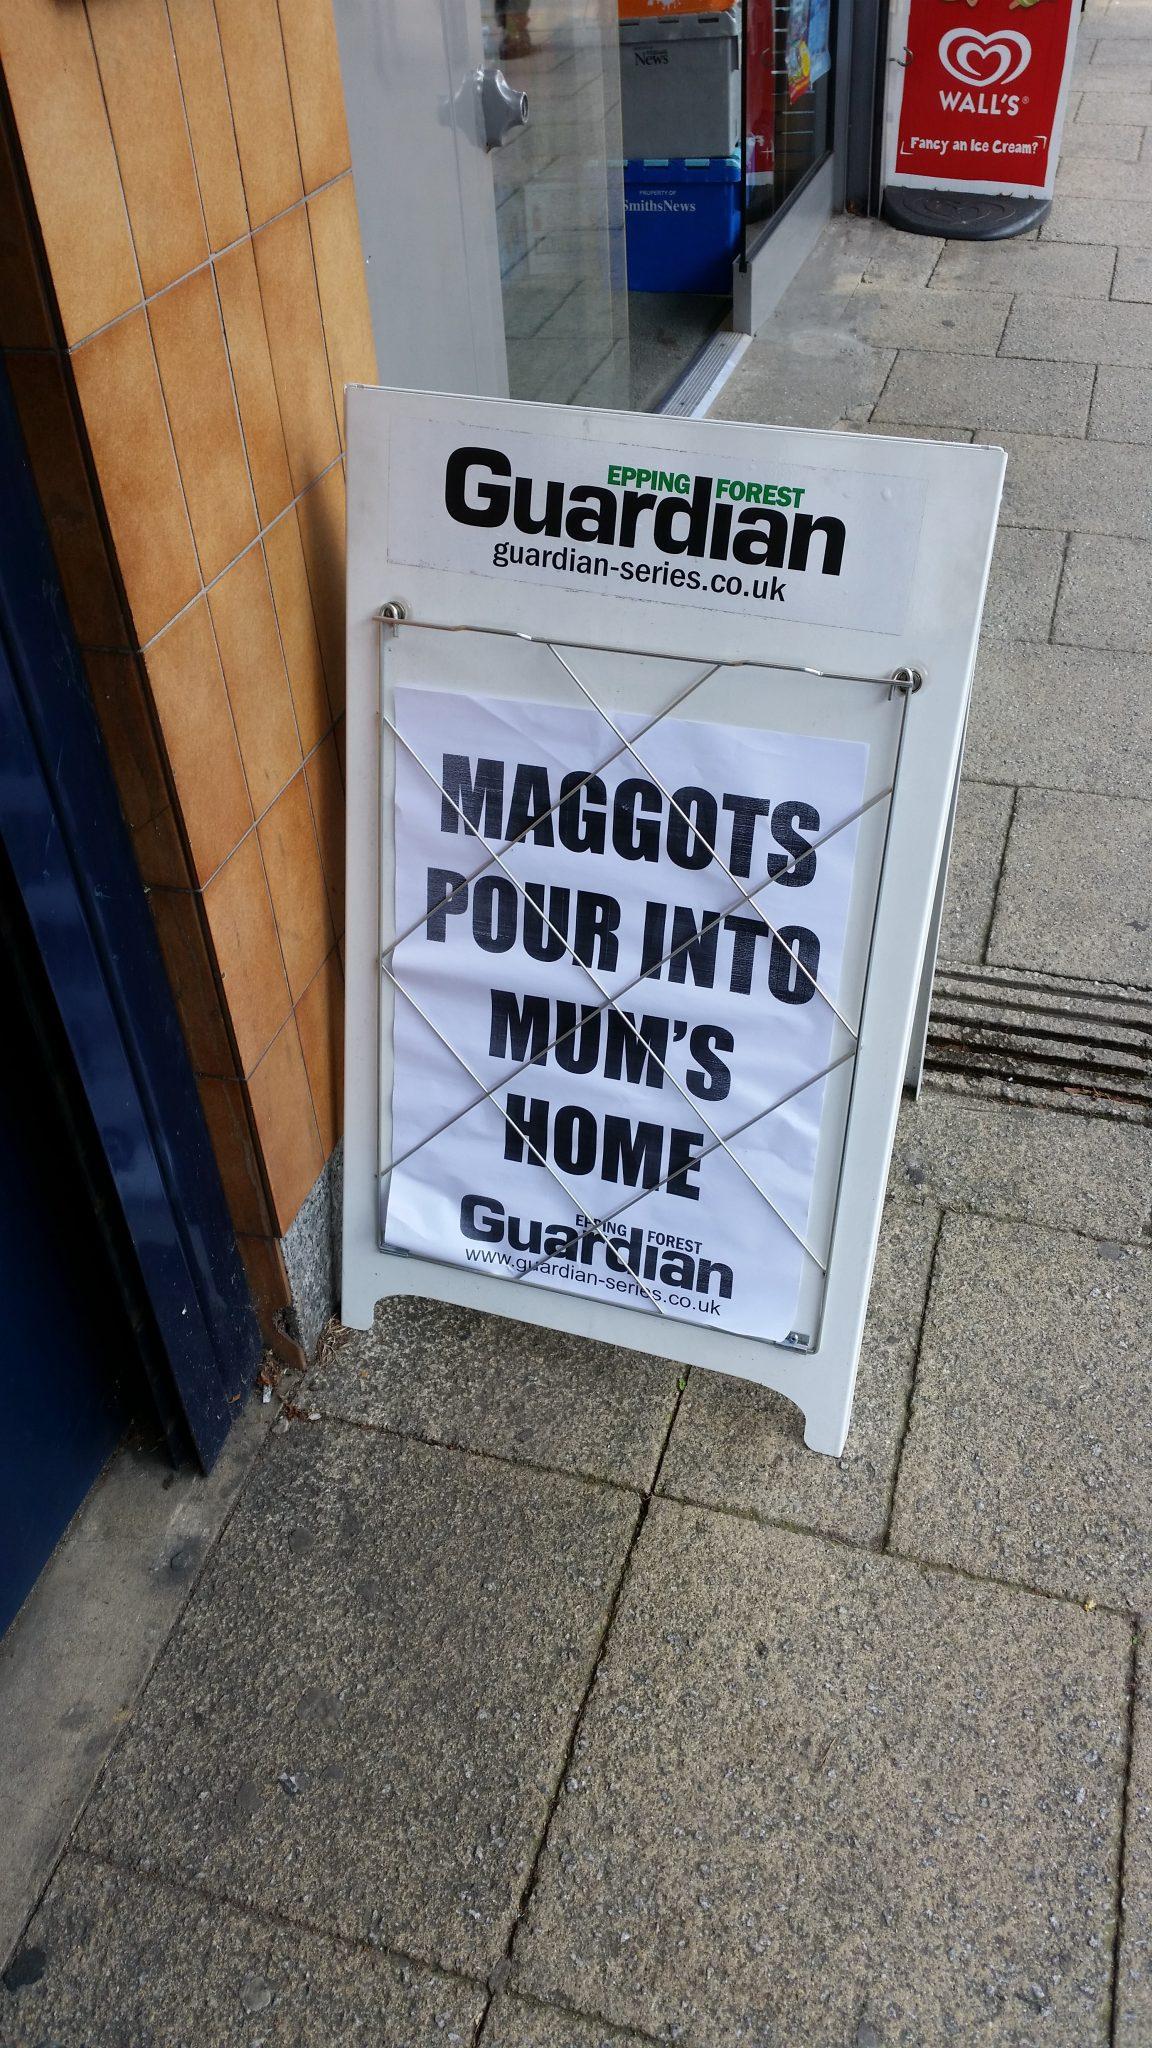 Maggots Pour into Mum's Home – #maggots #eppingforestguardian